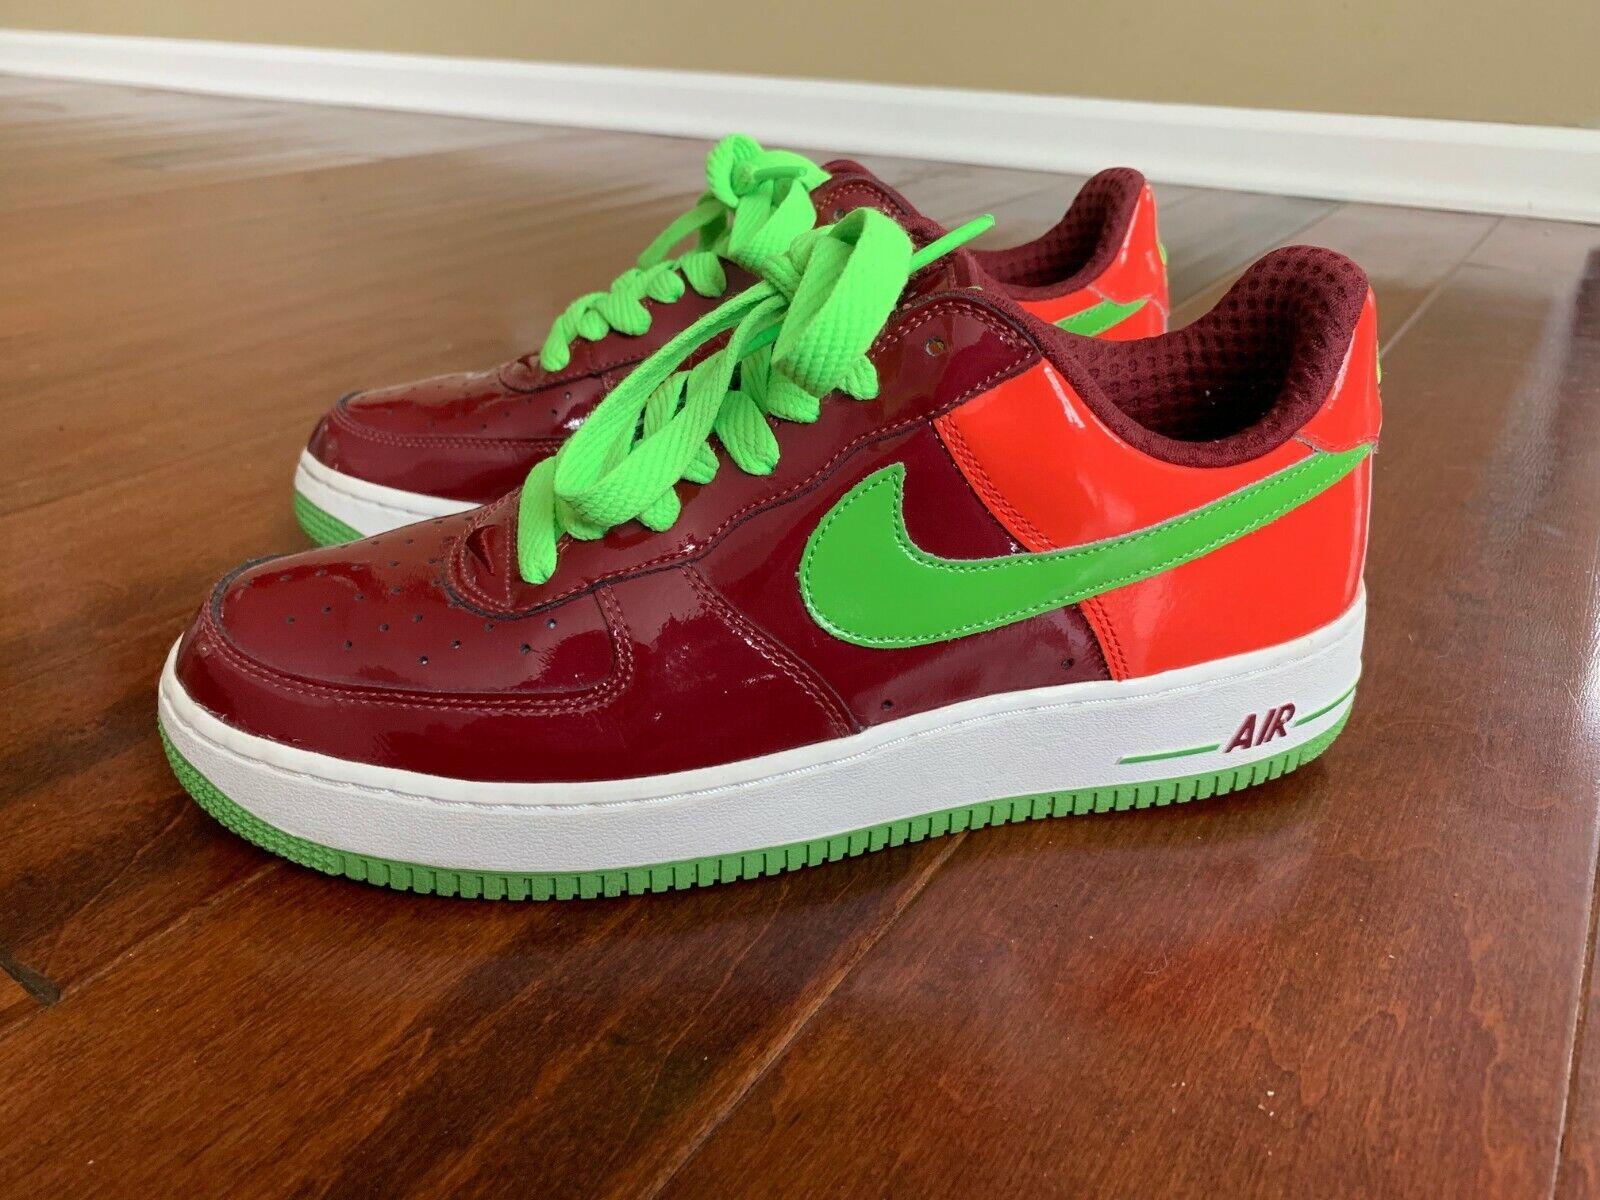 Nike Air Force 1 Low Premium Kiwi Watermelon Size 10